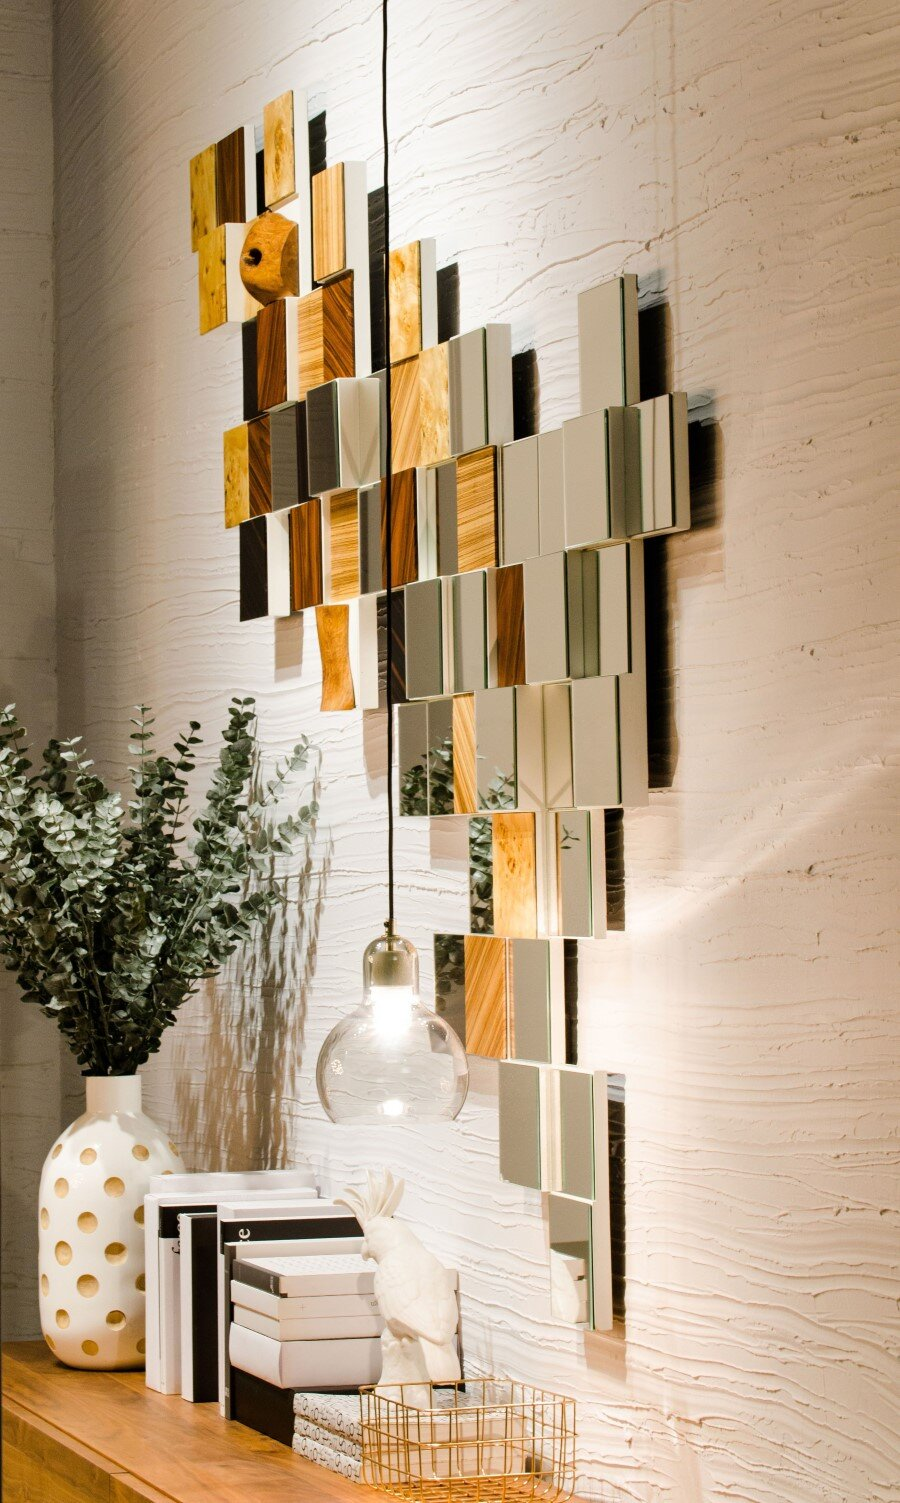 Collage Mirror- Fresh and Dynamic Mirror Mosaic by Amarist (2)